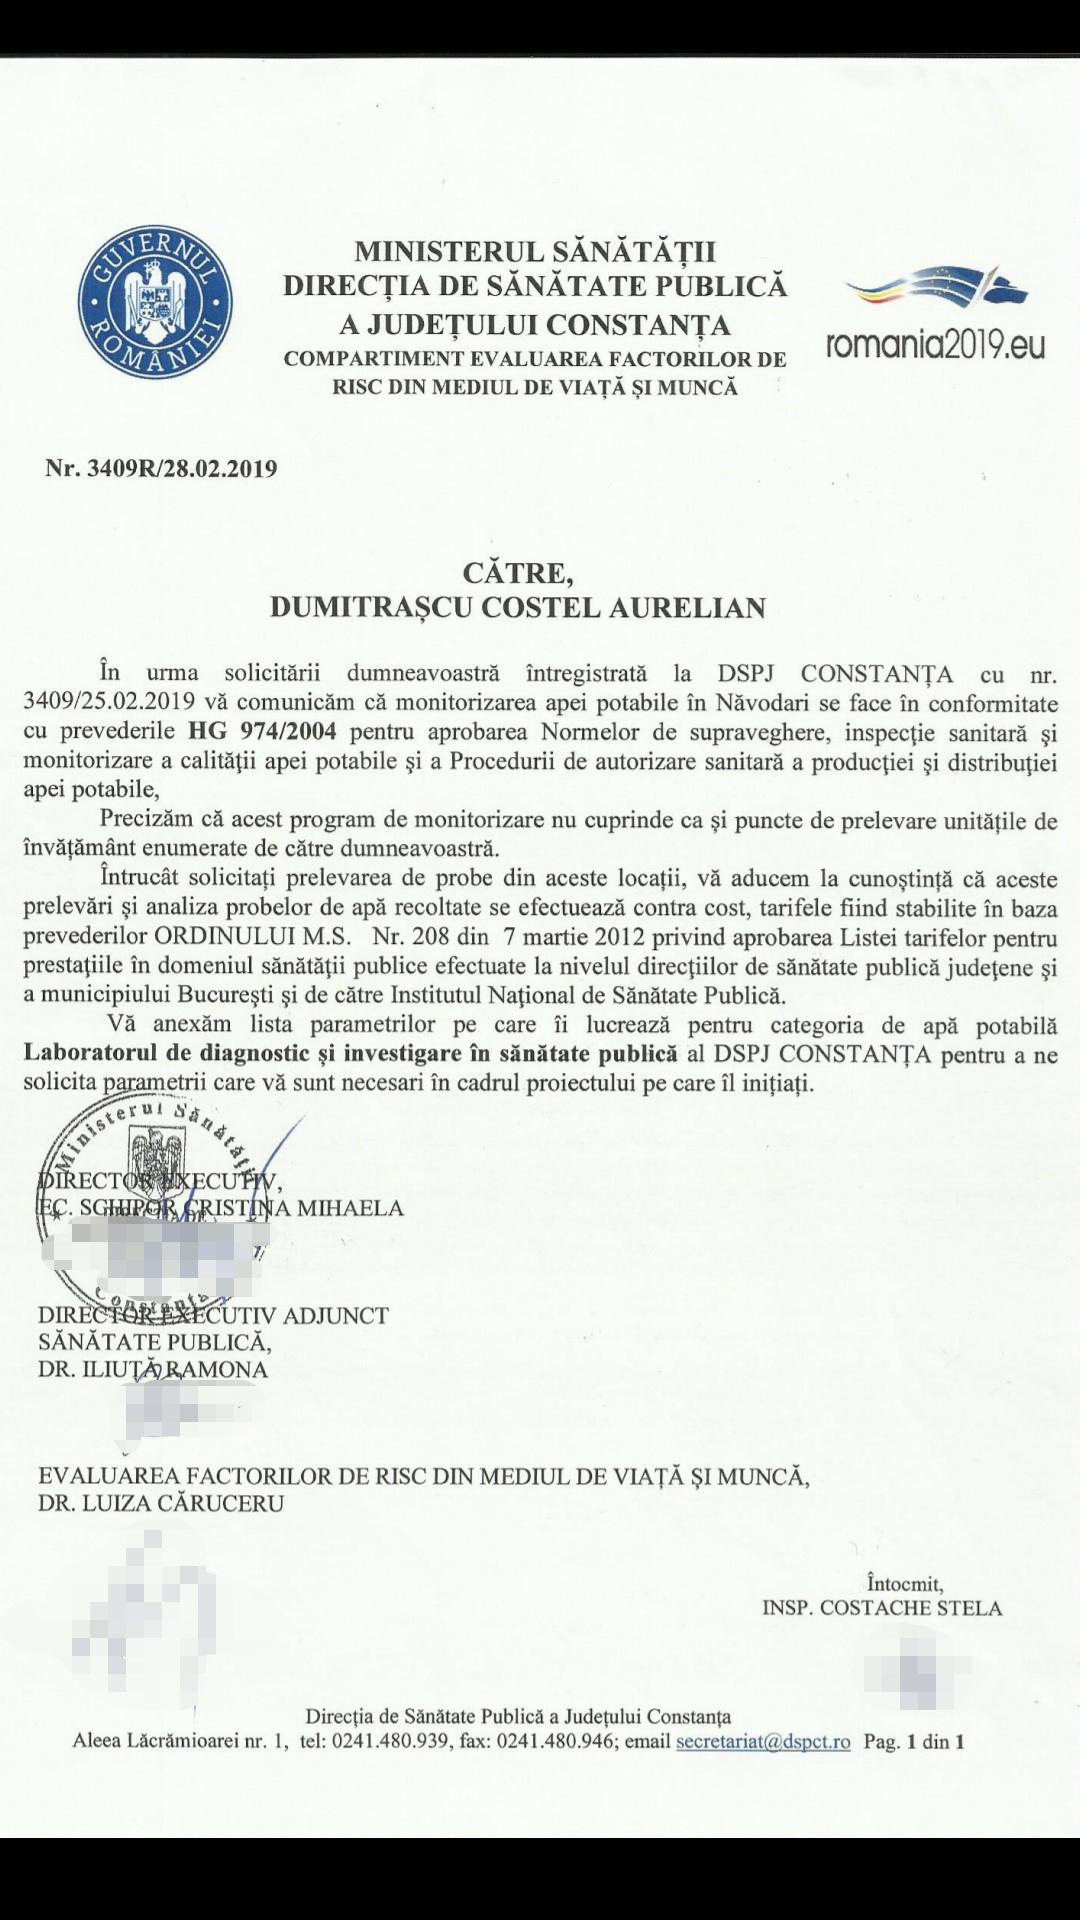 Adresa DSPCT dumitrascu costel navodari